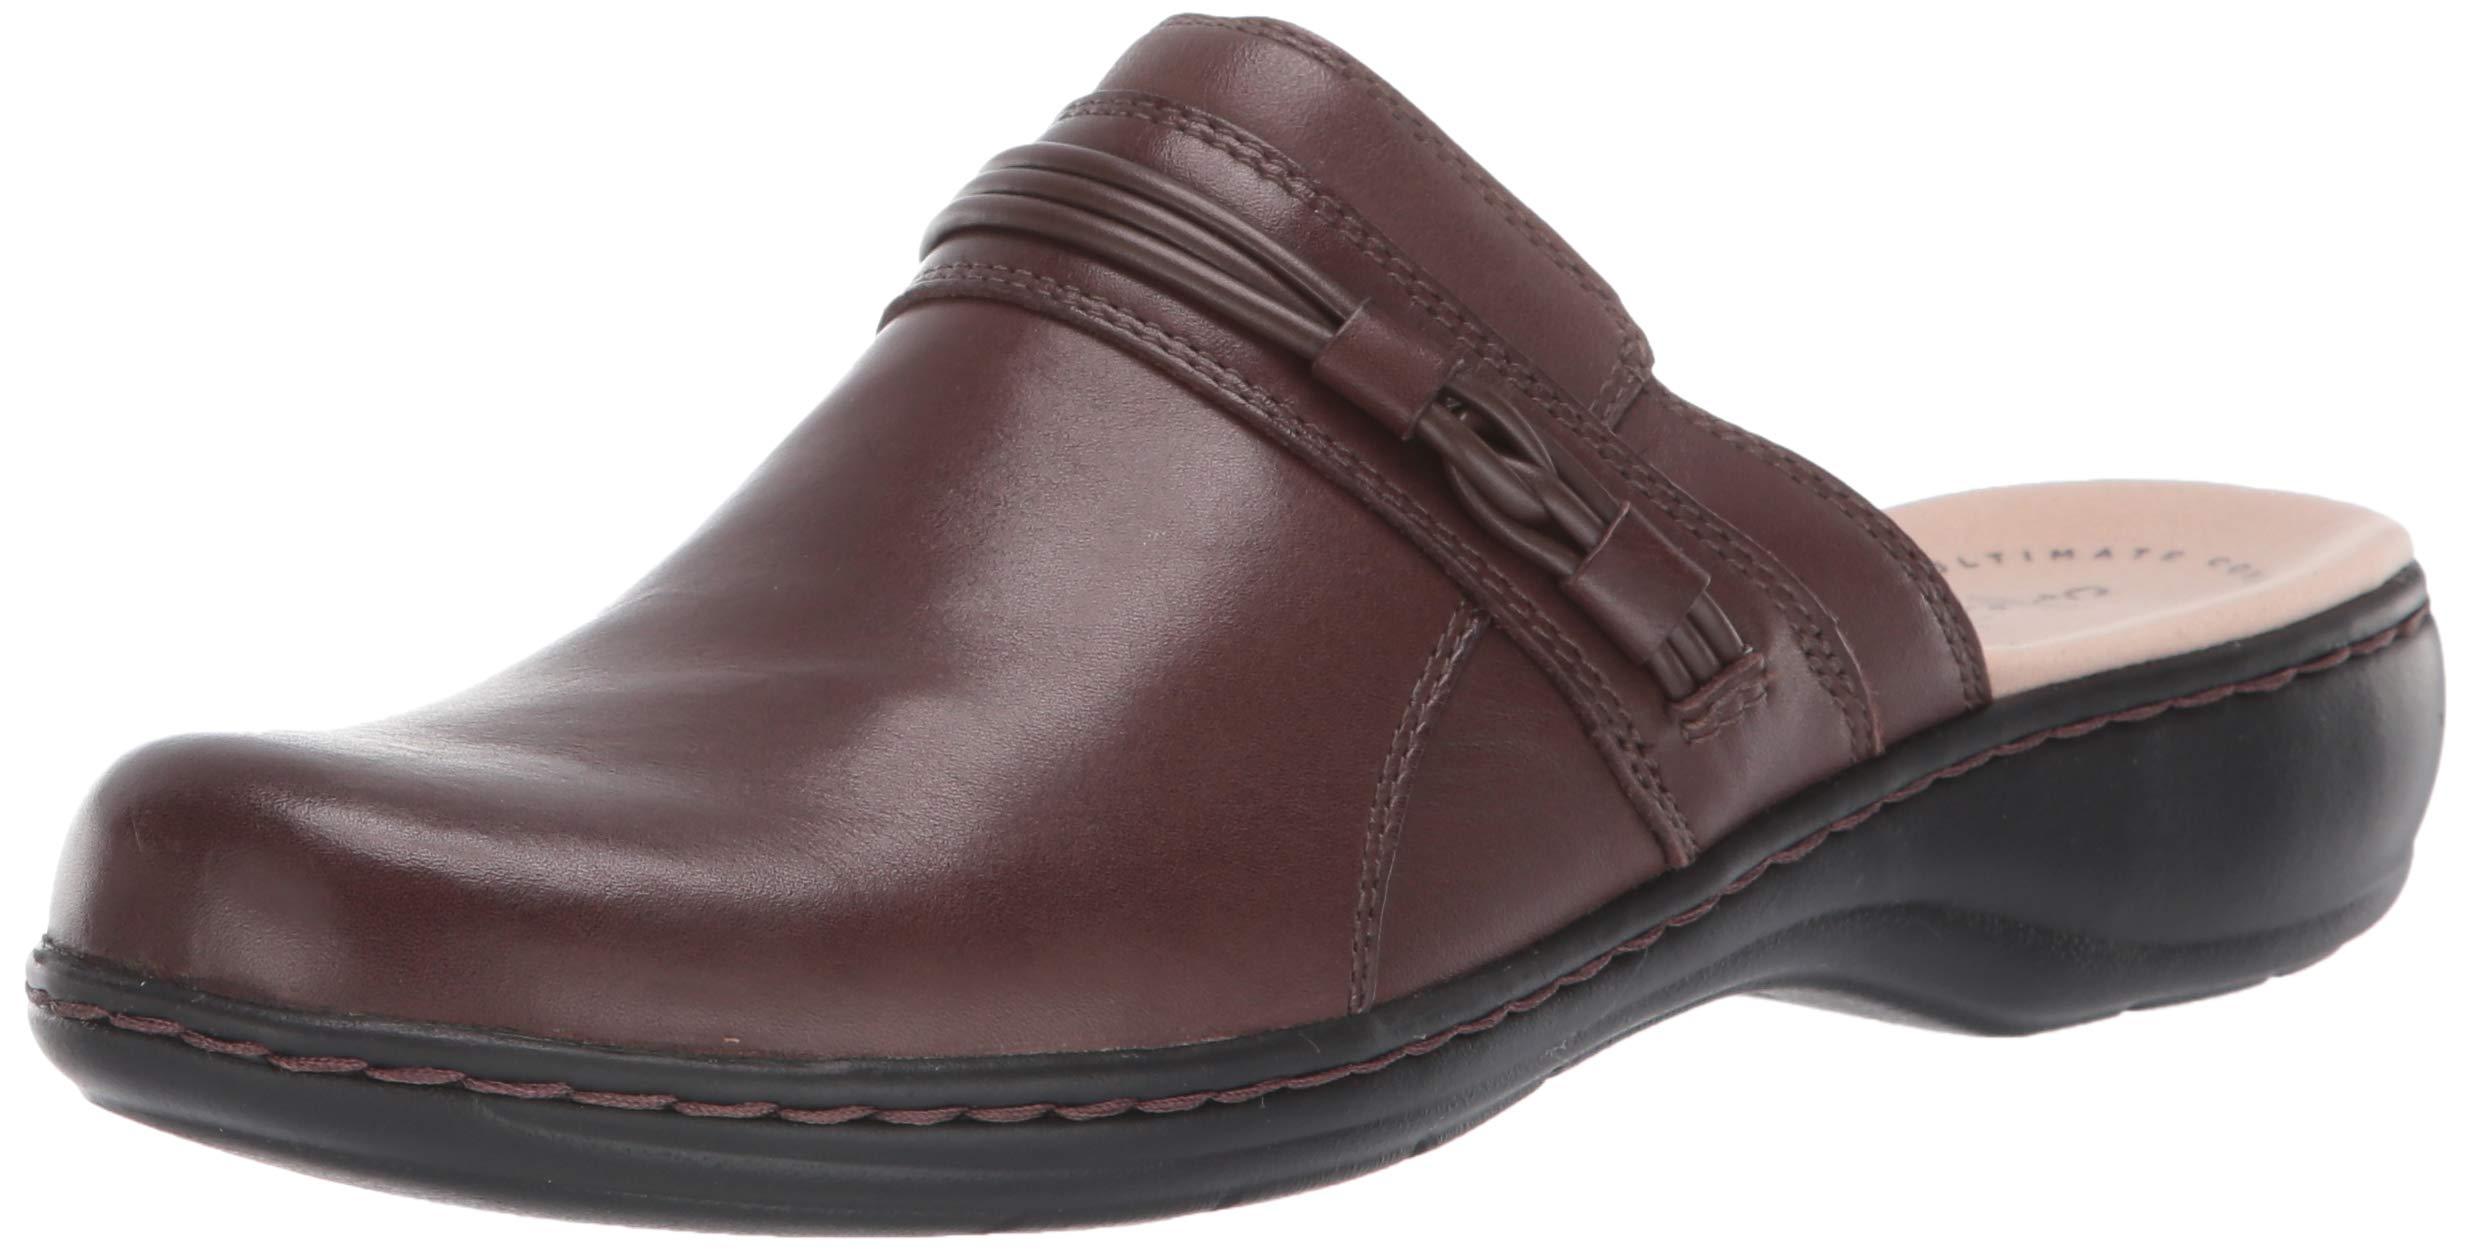 CLARKS Women's Leisa Clover Clog, Dark Brown Leather, 90 W US by CLARKS